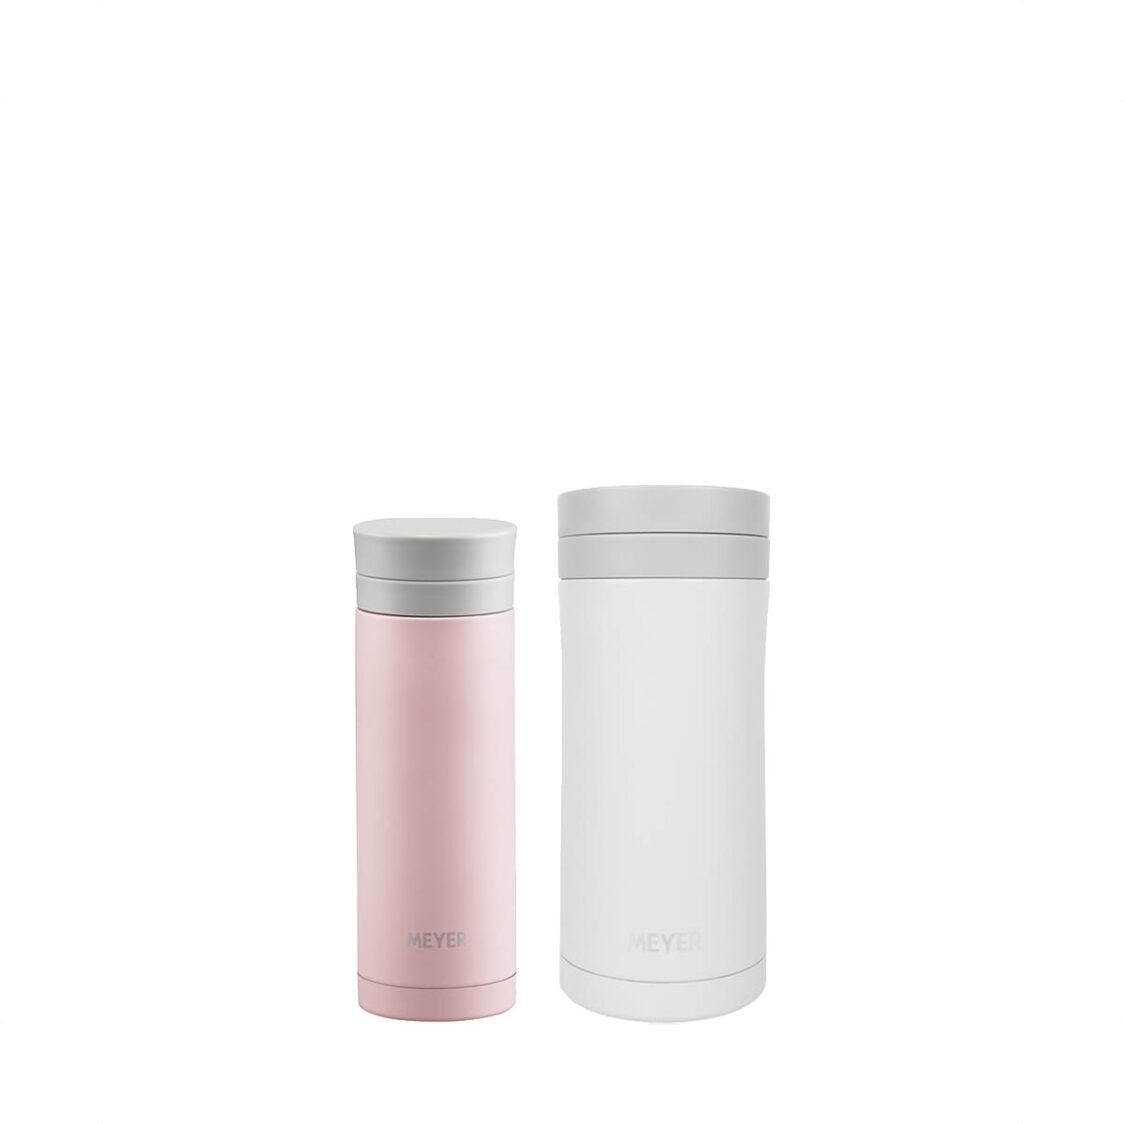 Meyer 250ml Vacuum Flask Light Pink  330ml Vacuum Mug Light Beige